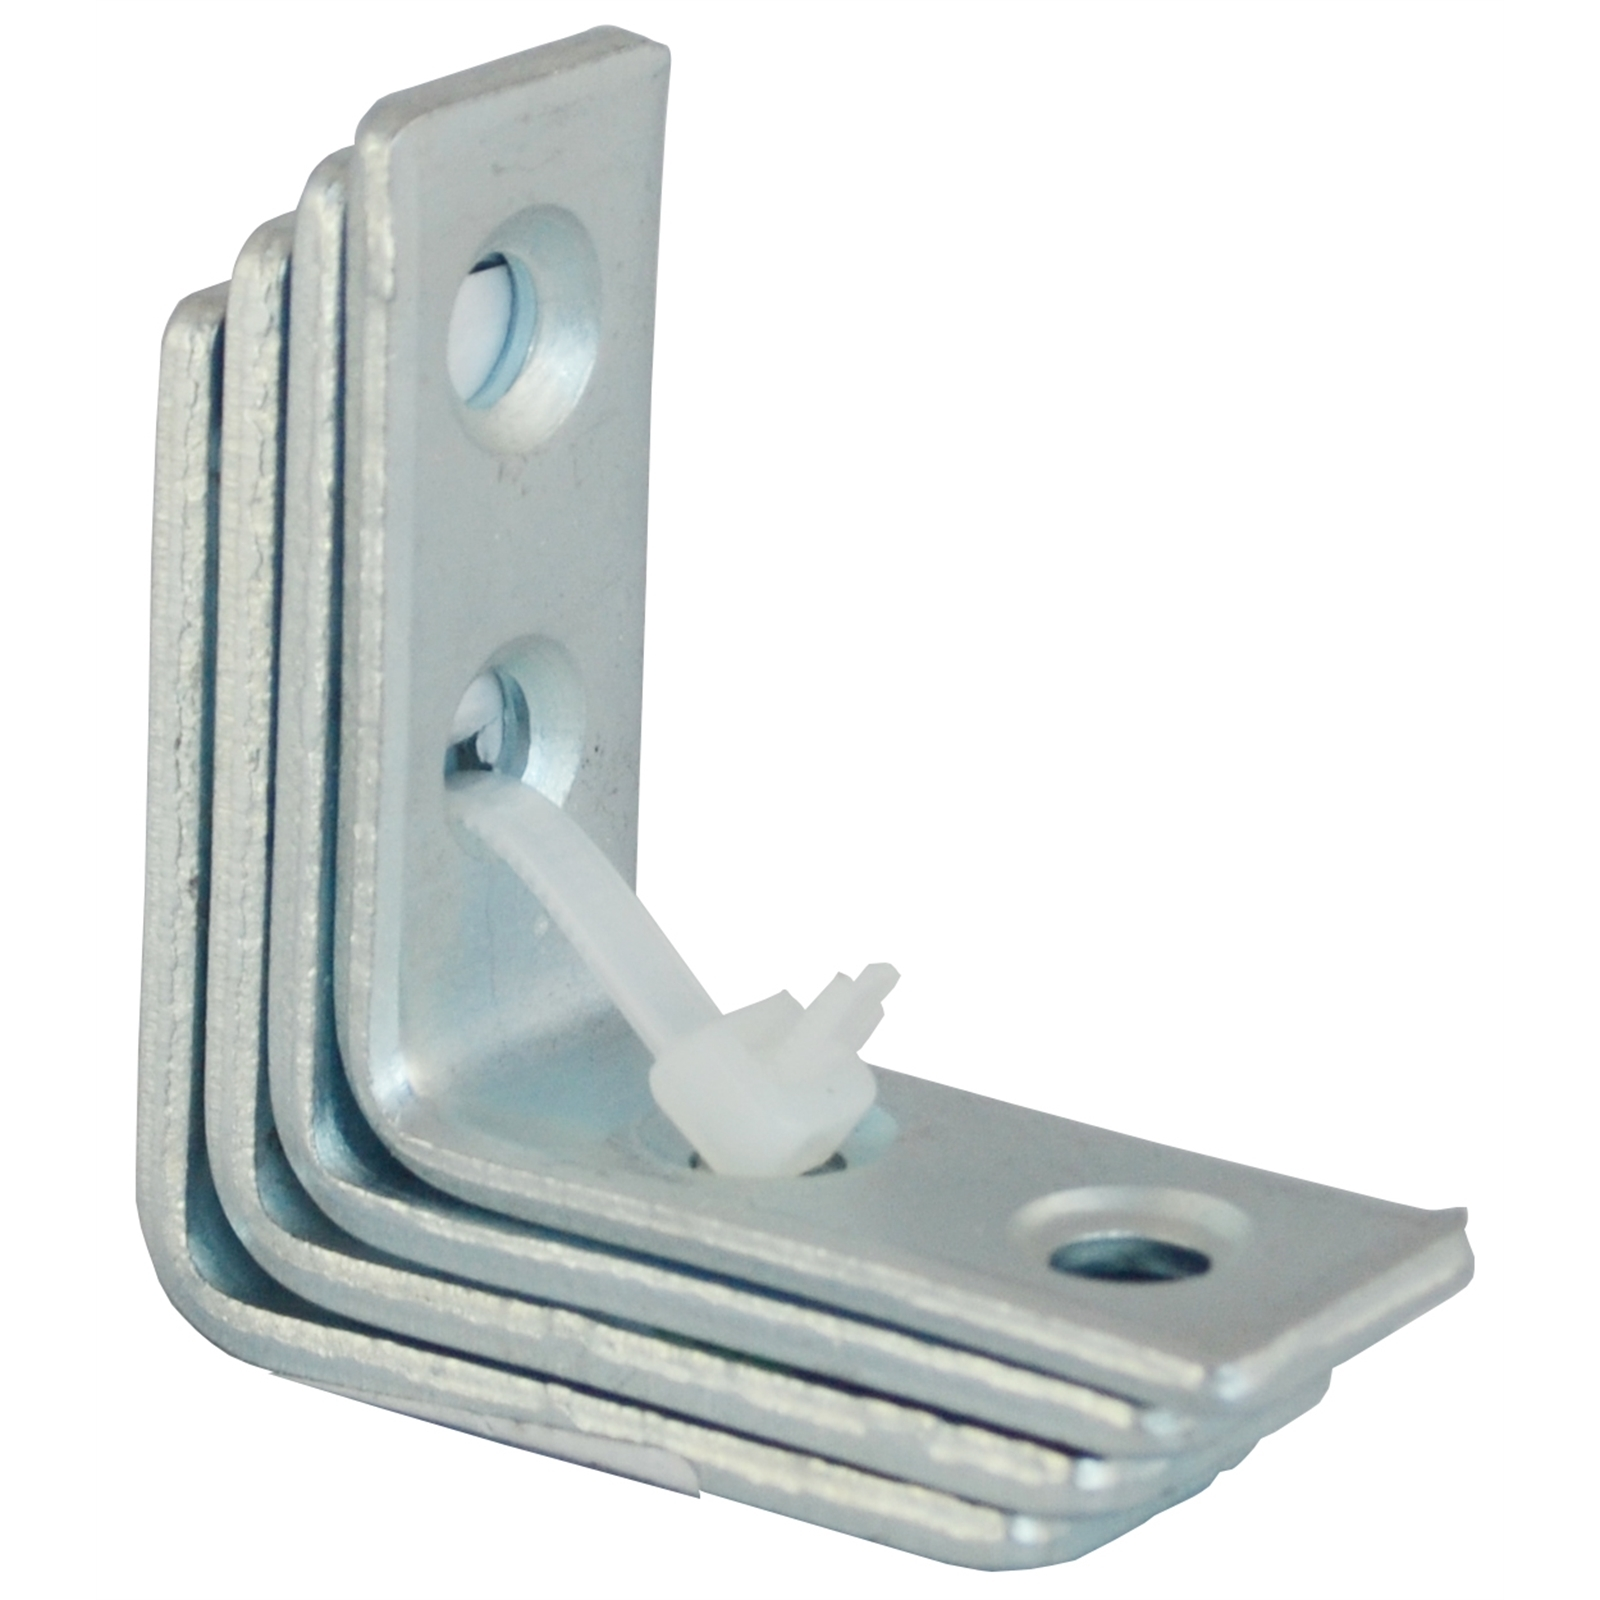 Carinya 50 x 50 x 20 x 3.5mm Zinc Plated Angle Bracket- 4 Pack